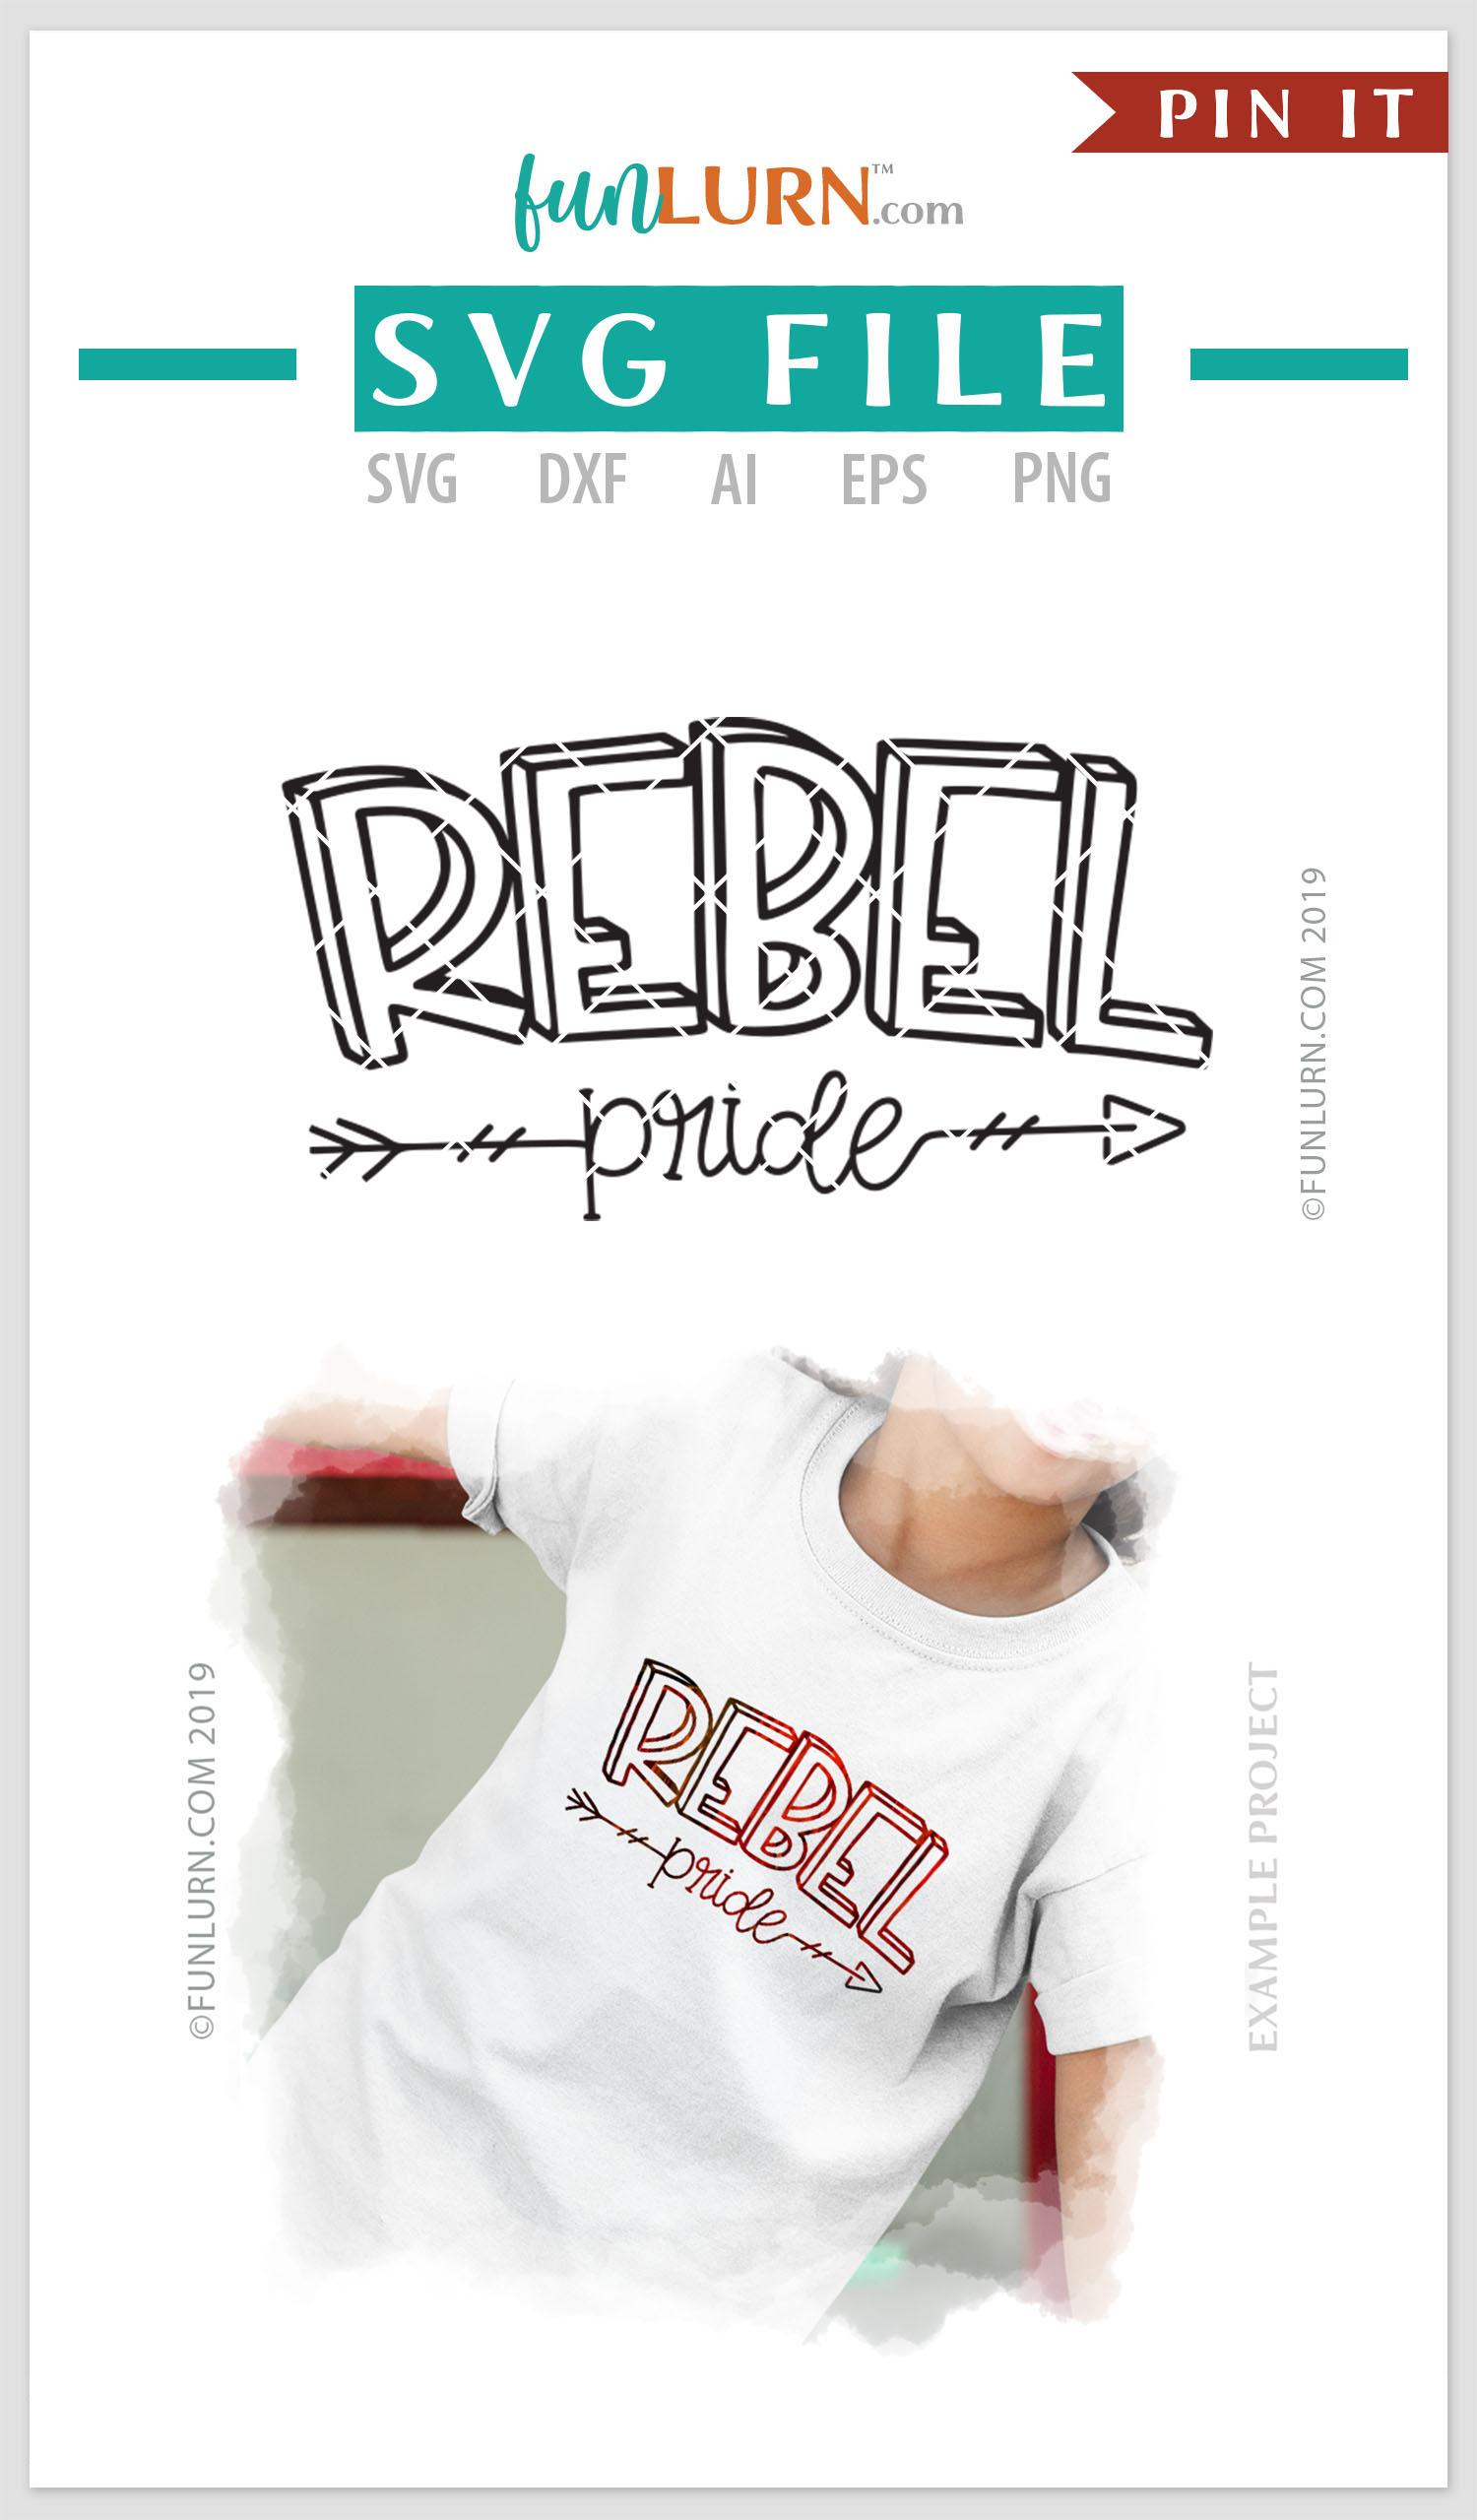 Rebel Pride Team SVG Cut File example image 4